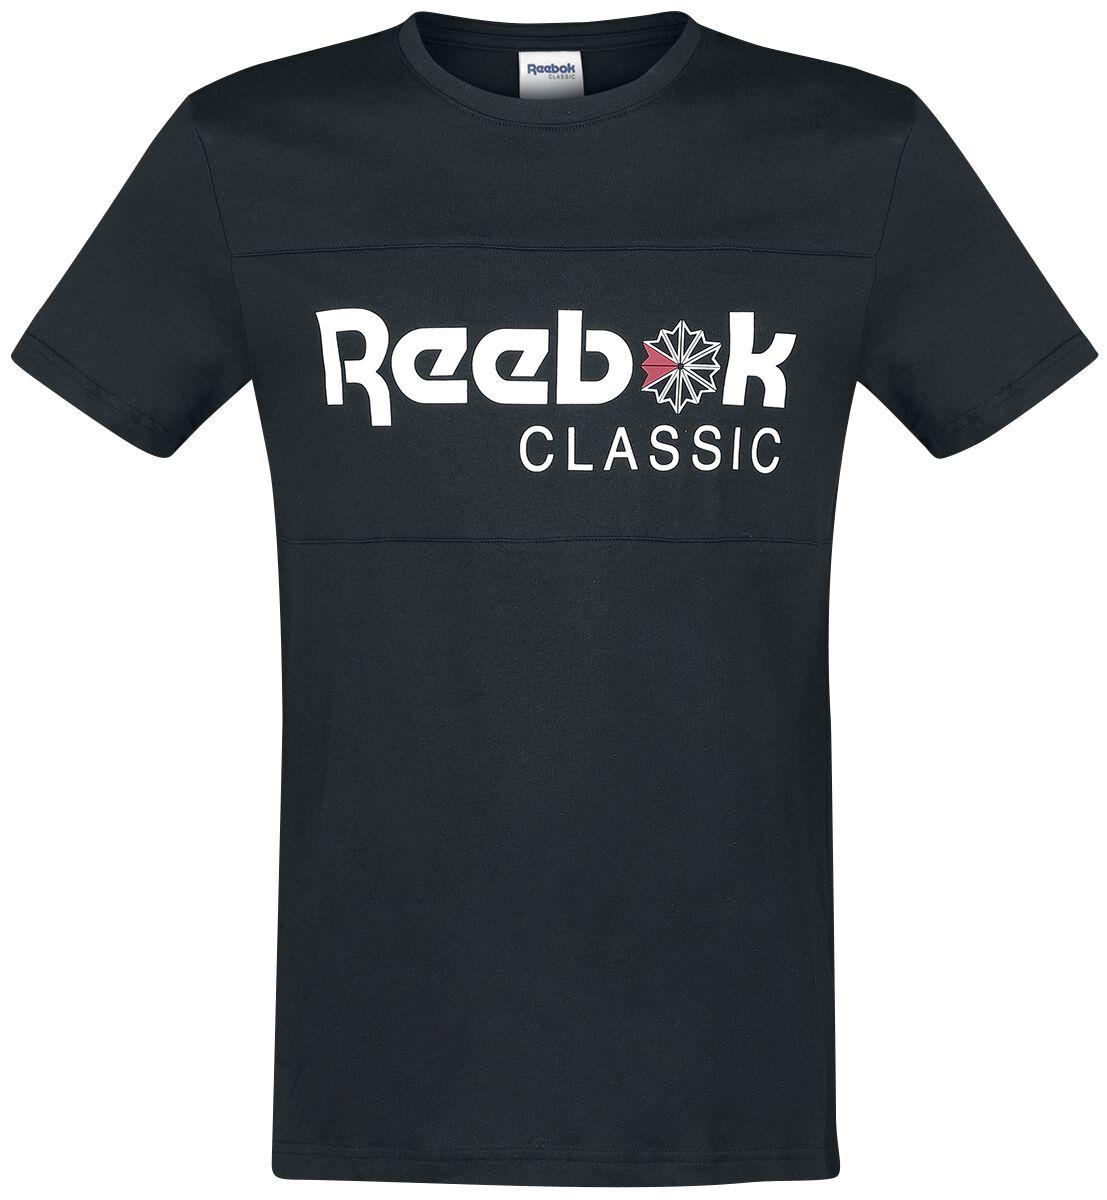 Image of   Reebok Franchise Iconic Tee T-Shirt sort